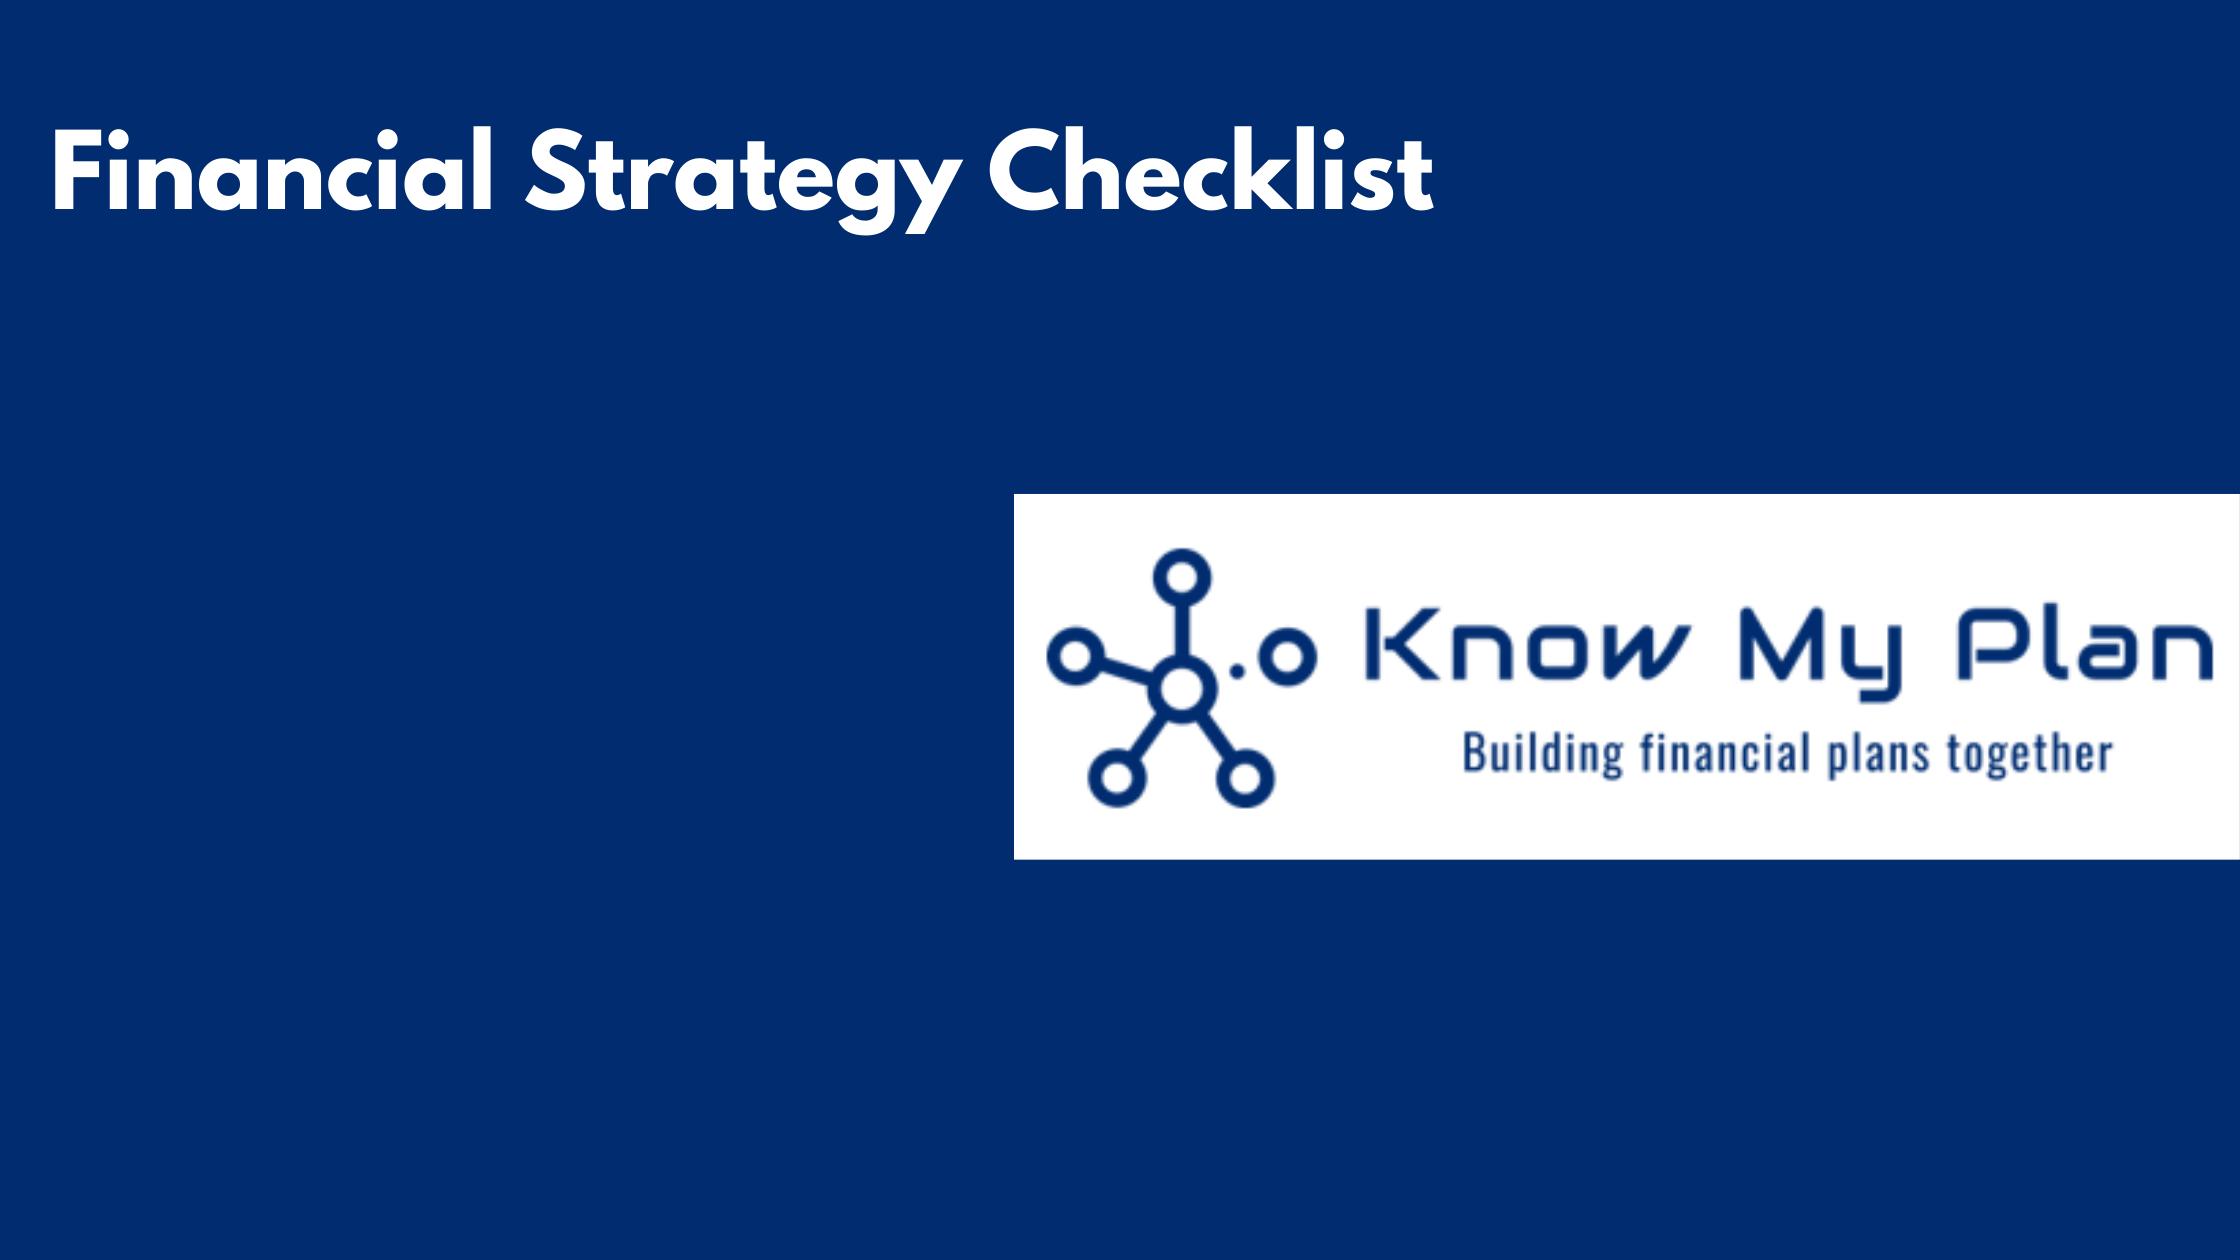 Financial Strategy Checklist Thumbnail